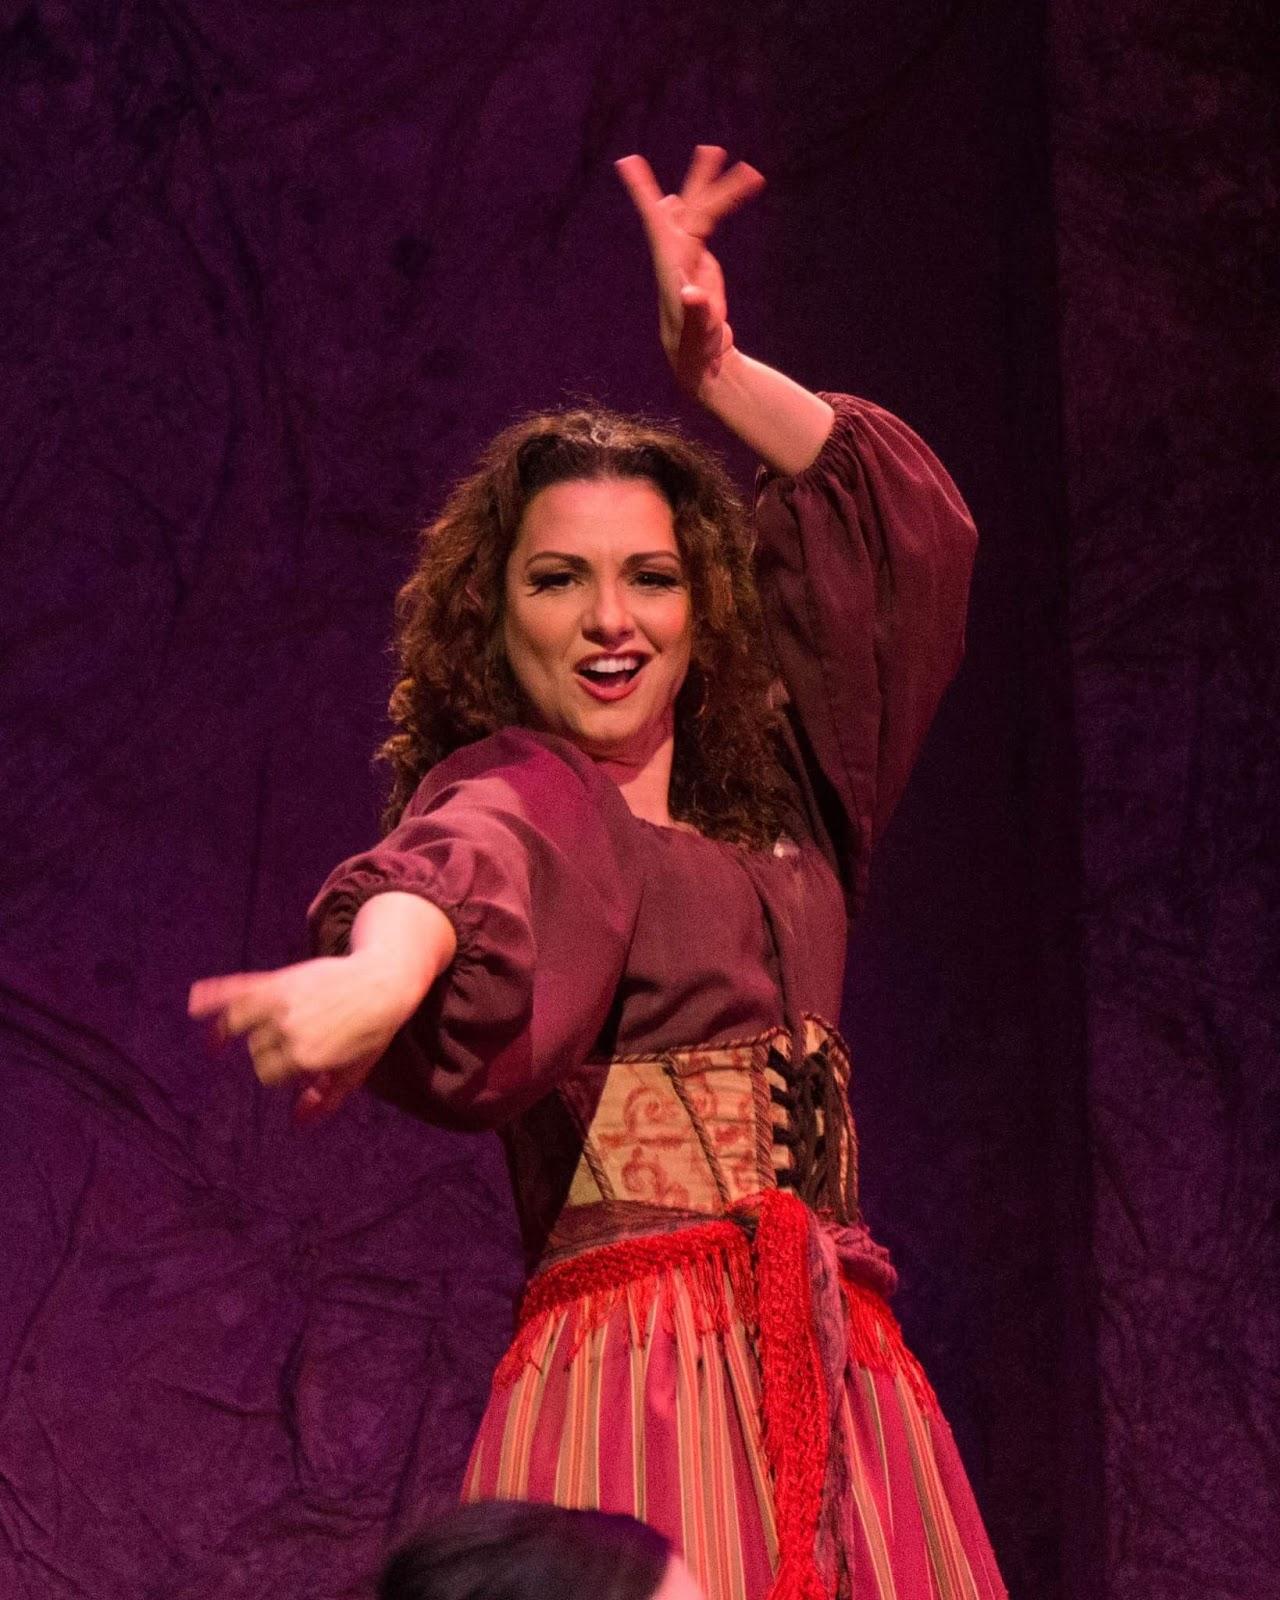 IN PERFORMANCE: Mezzo-soprano SANDRA PIQUES EDDY as the title heroine in Greensboro Opera's production of Georges Bizet's CARMEN, January 2017 [Photo © by Greensboro Opera]